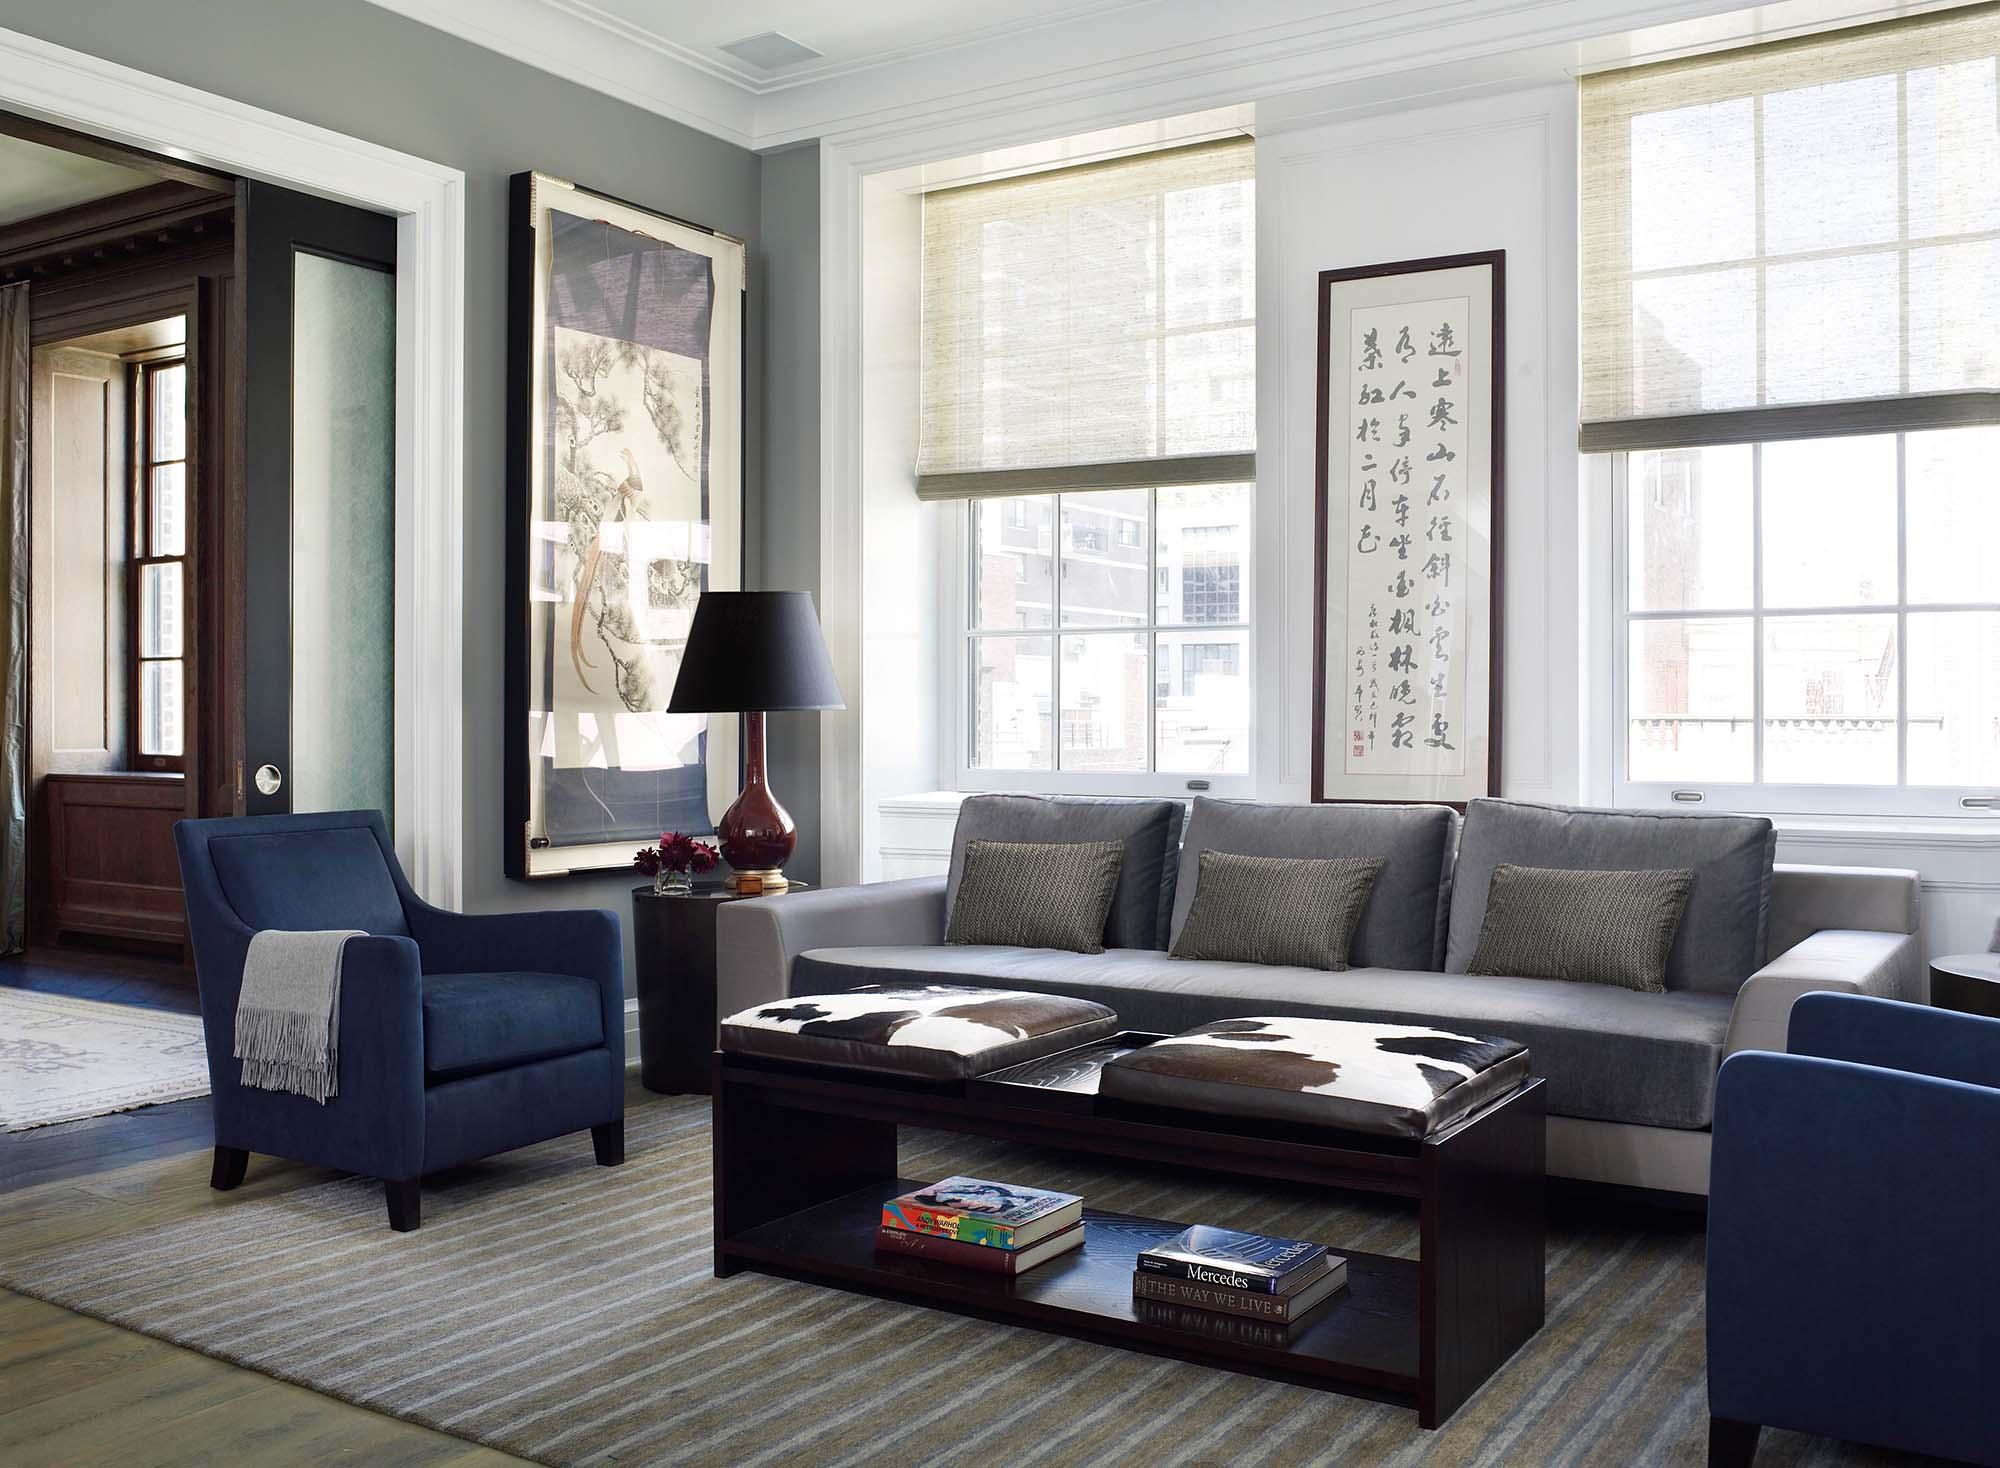 79th Street Apartment, Lenox Hill, Manhattan, Central Park transitional, living room family room pocket doors, cow pillows